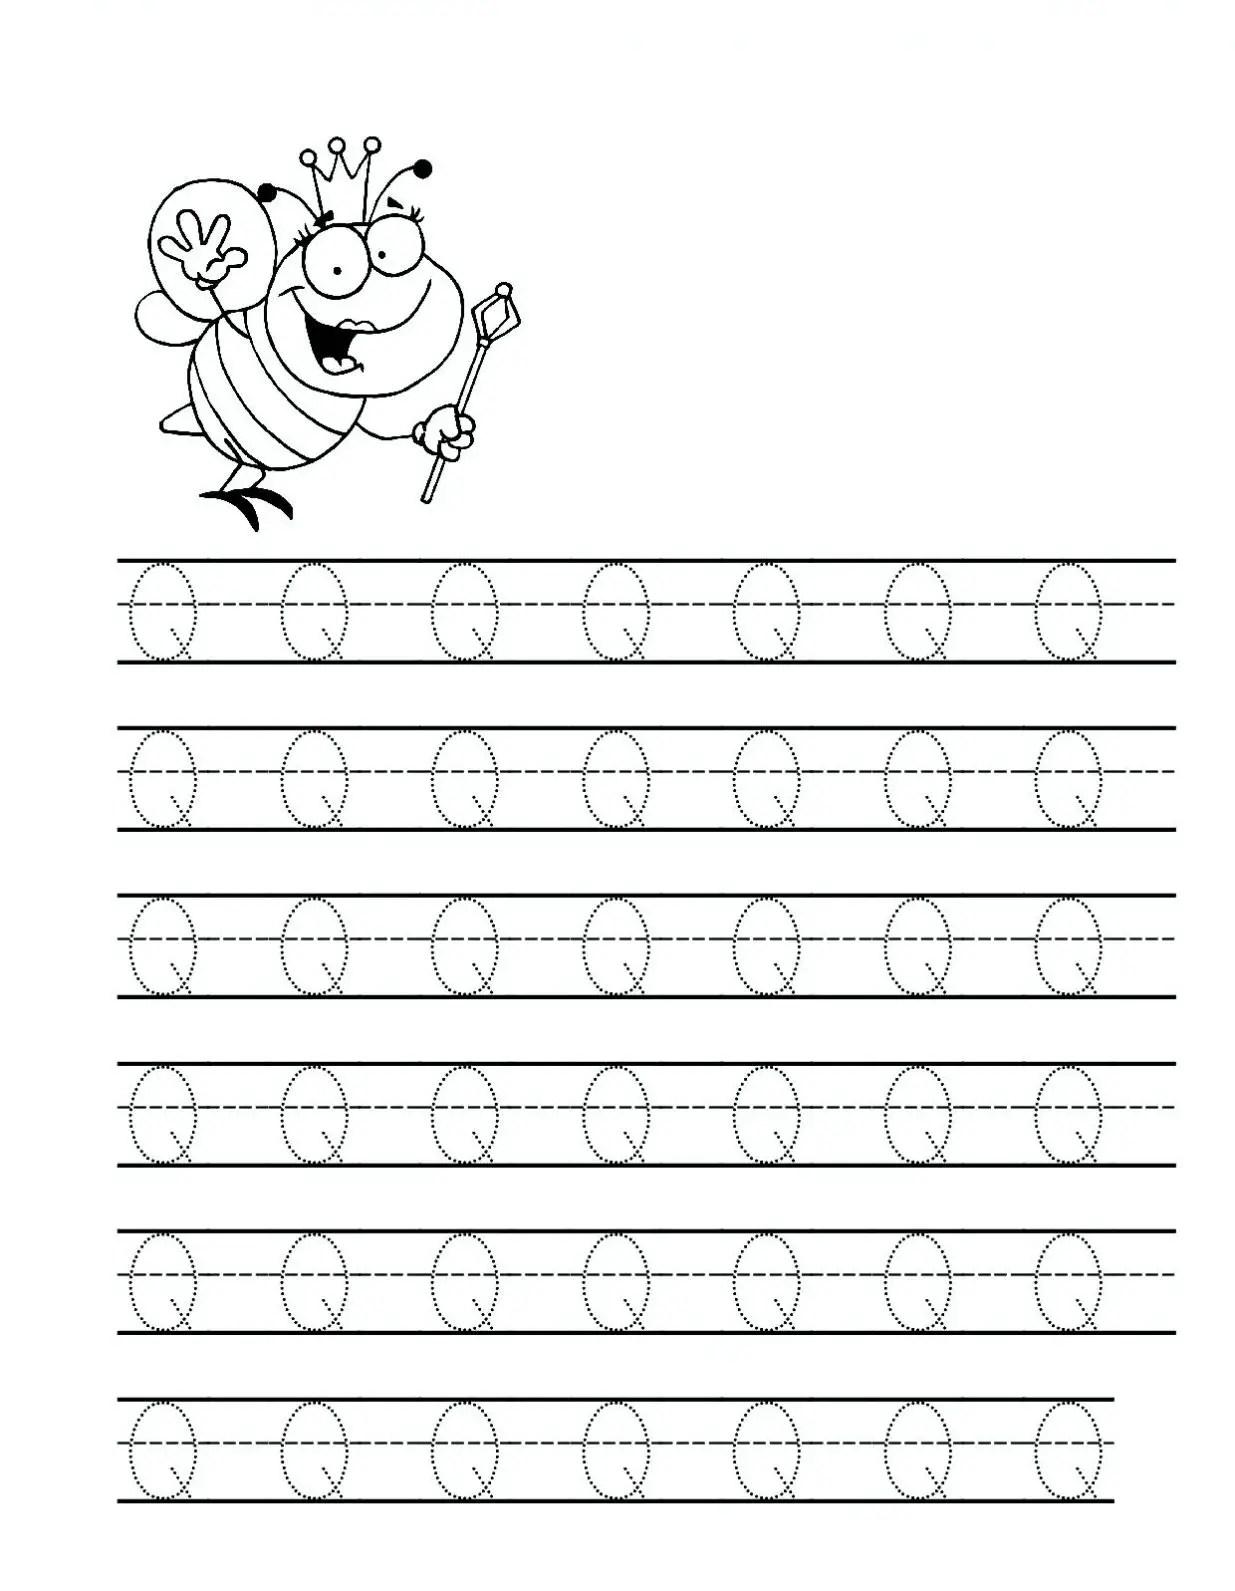 15 Educative Letter Q Worksheets